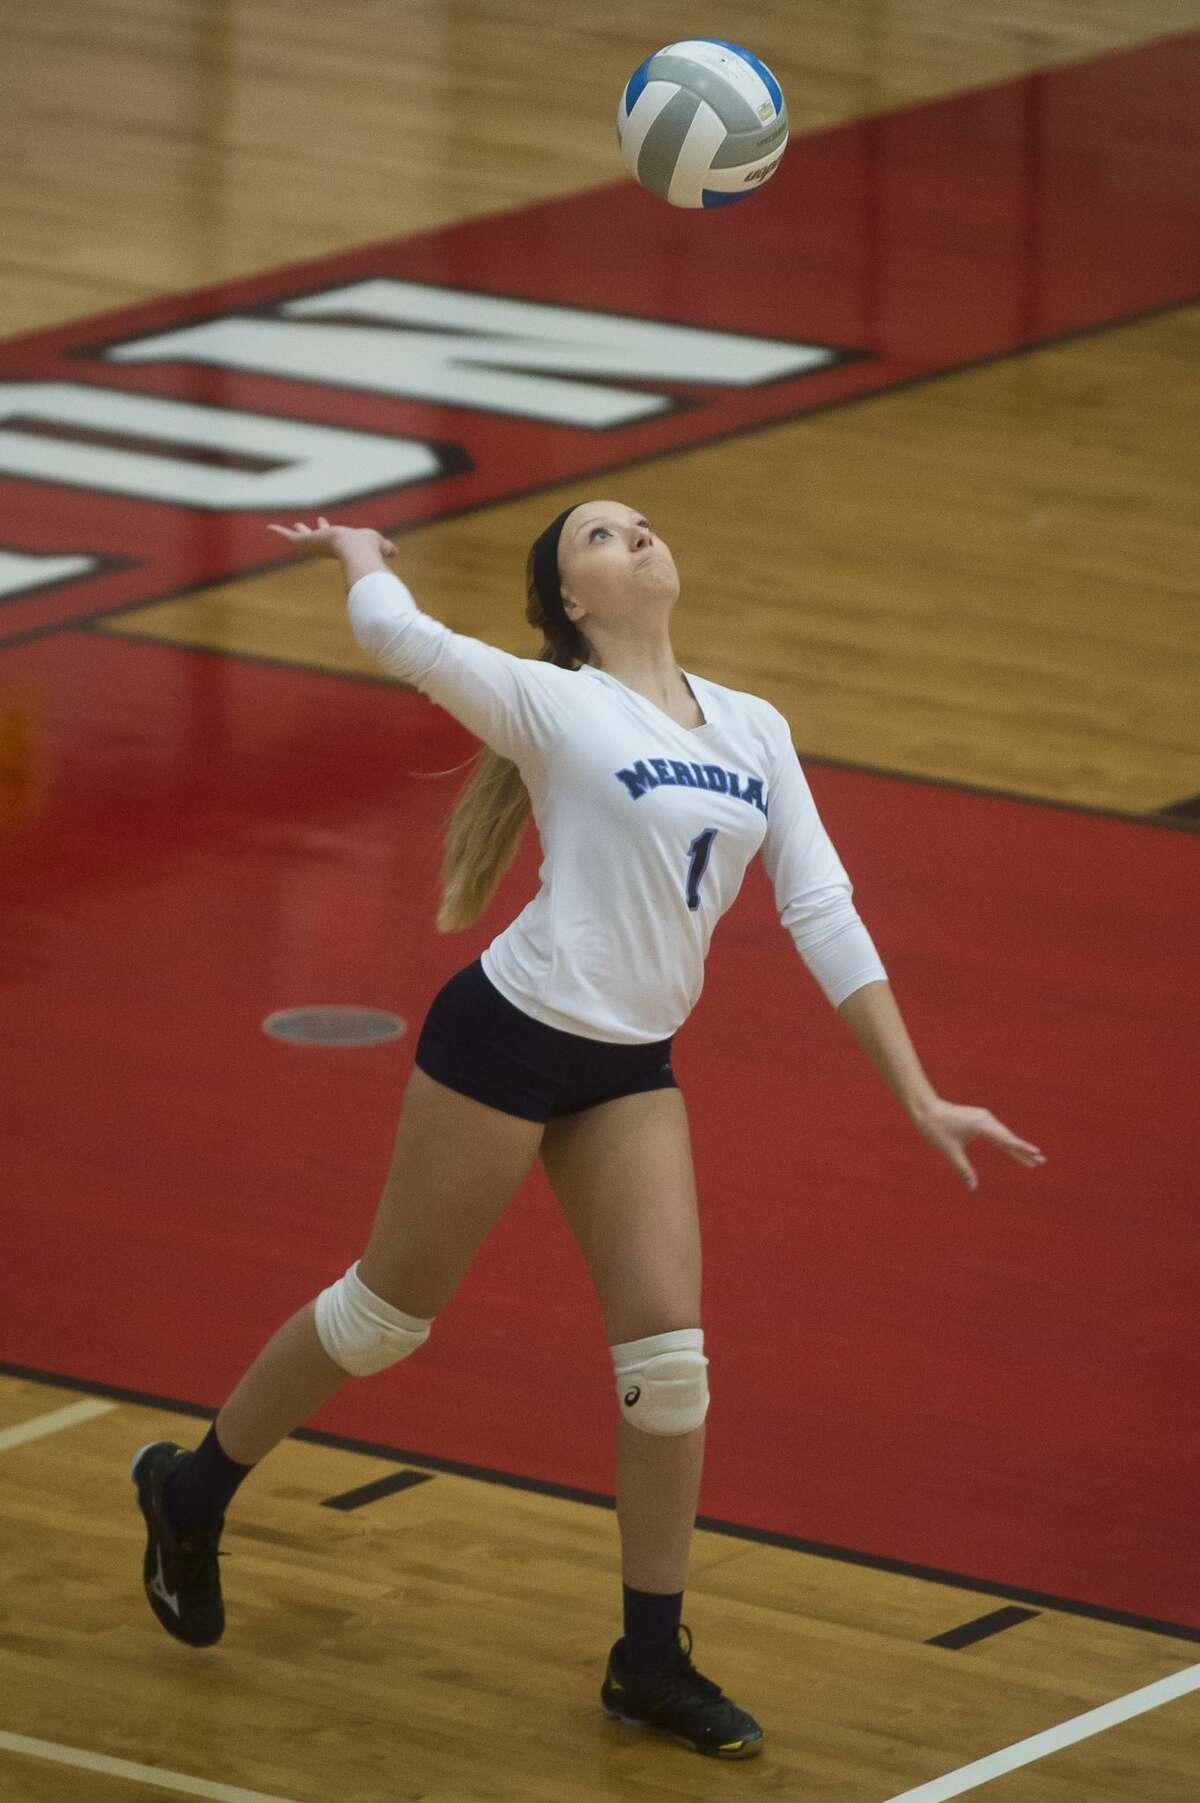 Meridian senior Kaylee LaVack serves the ball during a game against Pinconning on Monday, Oct. 30, 2017 at Beaverton High School. (Katy Kildee/kkildee@mdn.net)